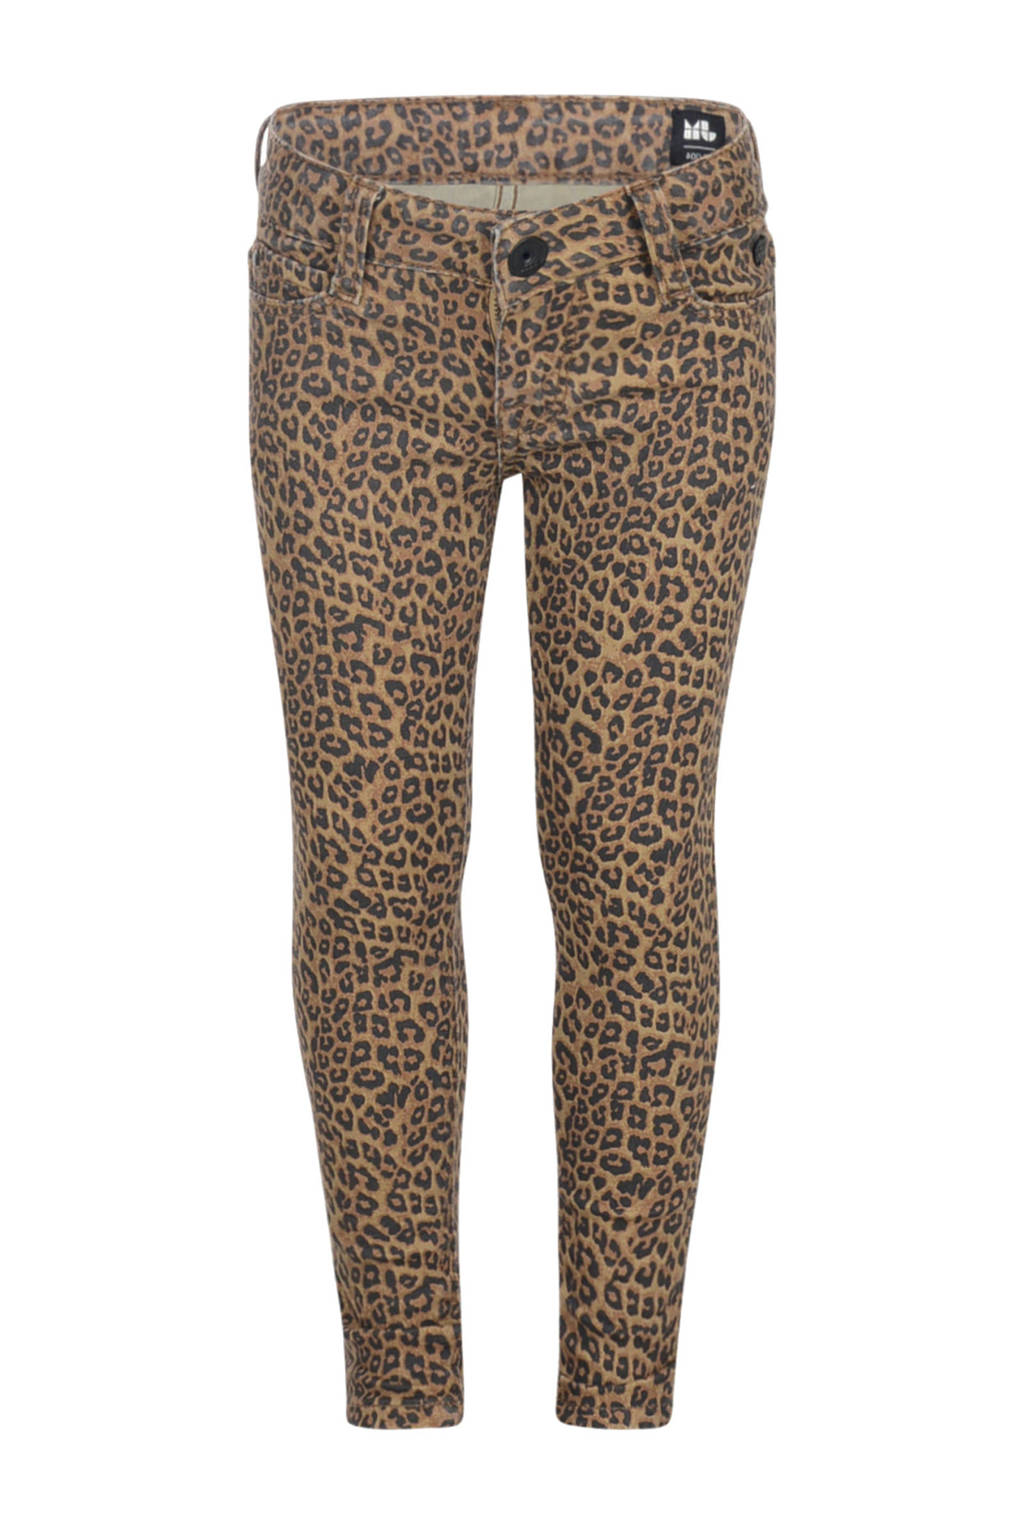 Jill skinny broek May met panterprint bruin/zwart, Bruin/zwart